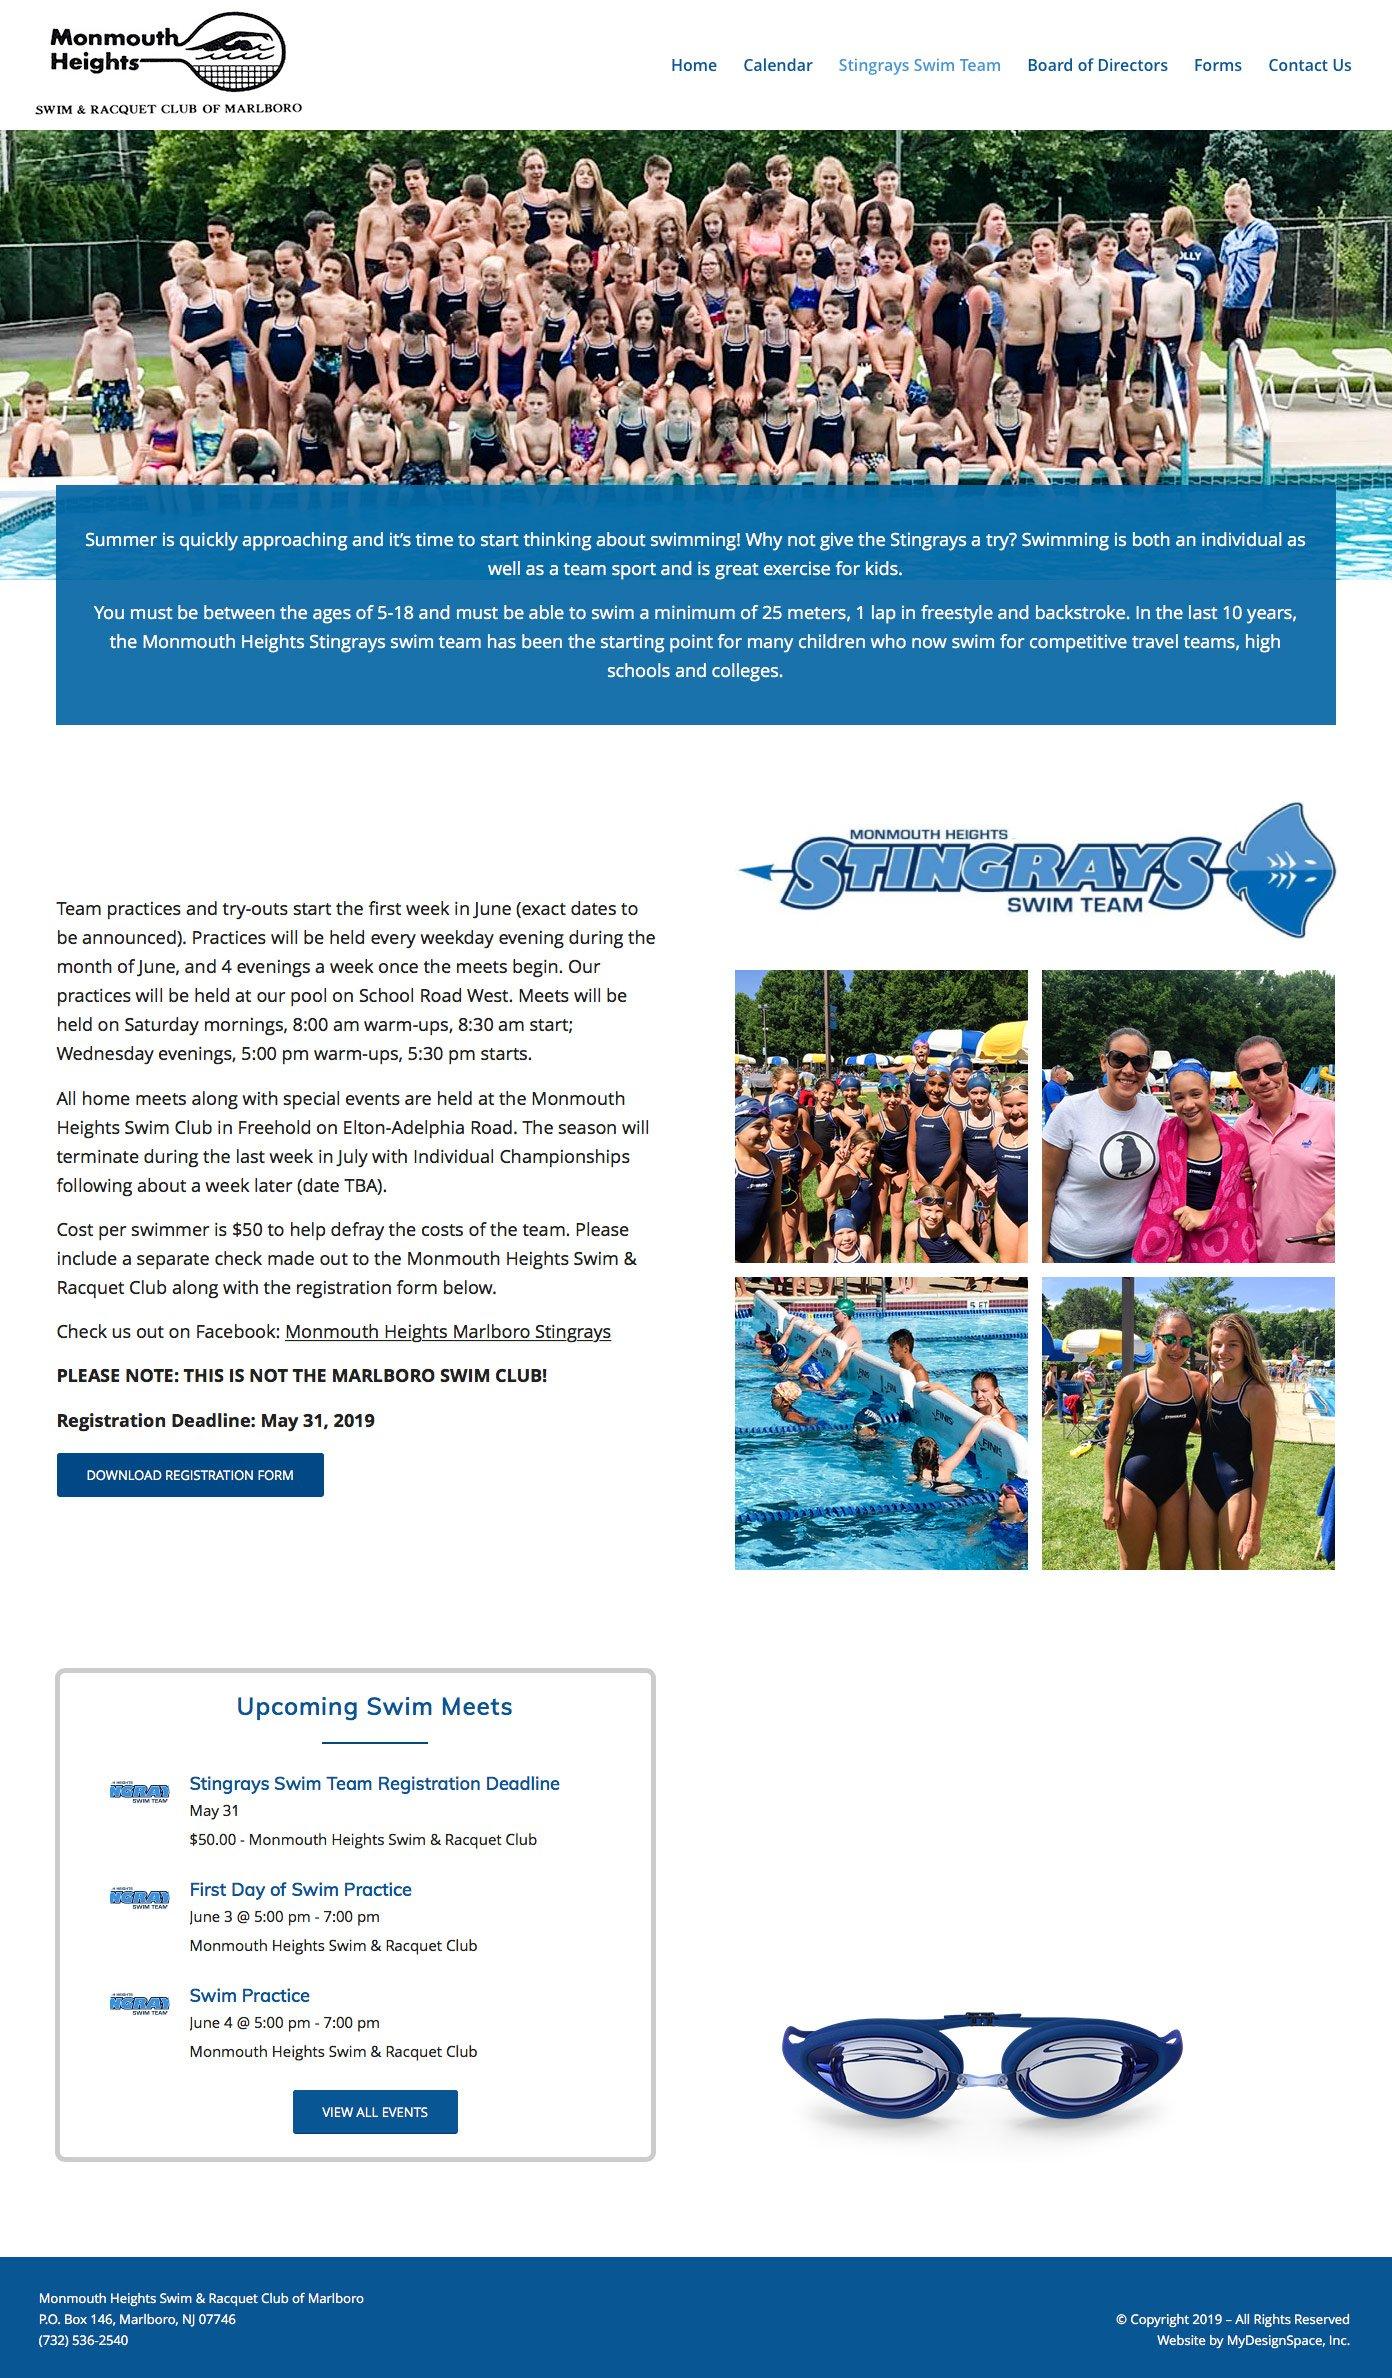 MHSRC Swim Team Page